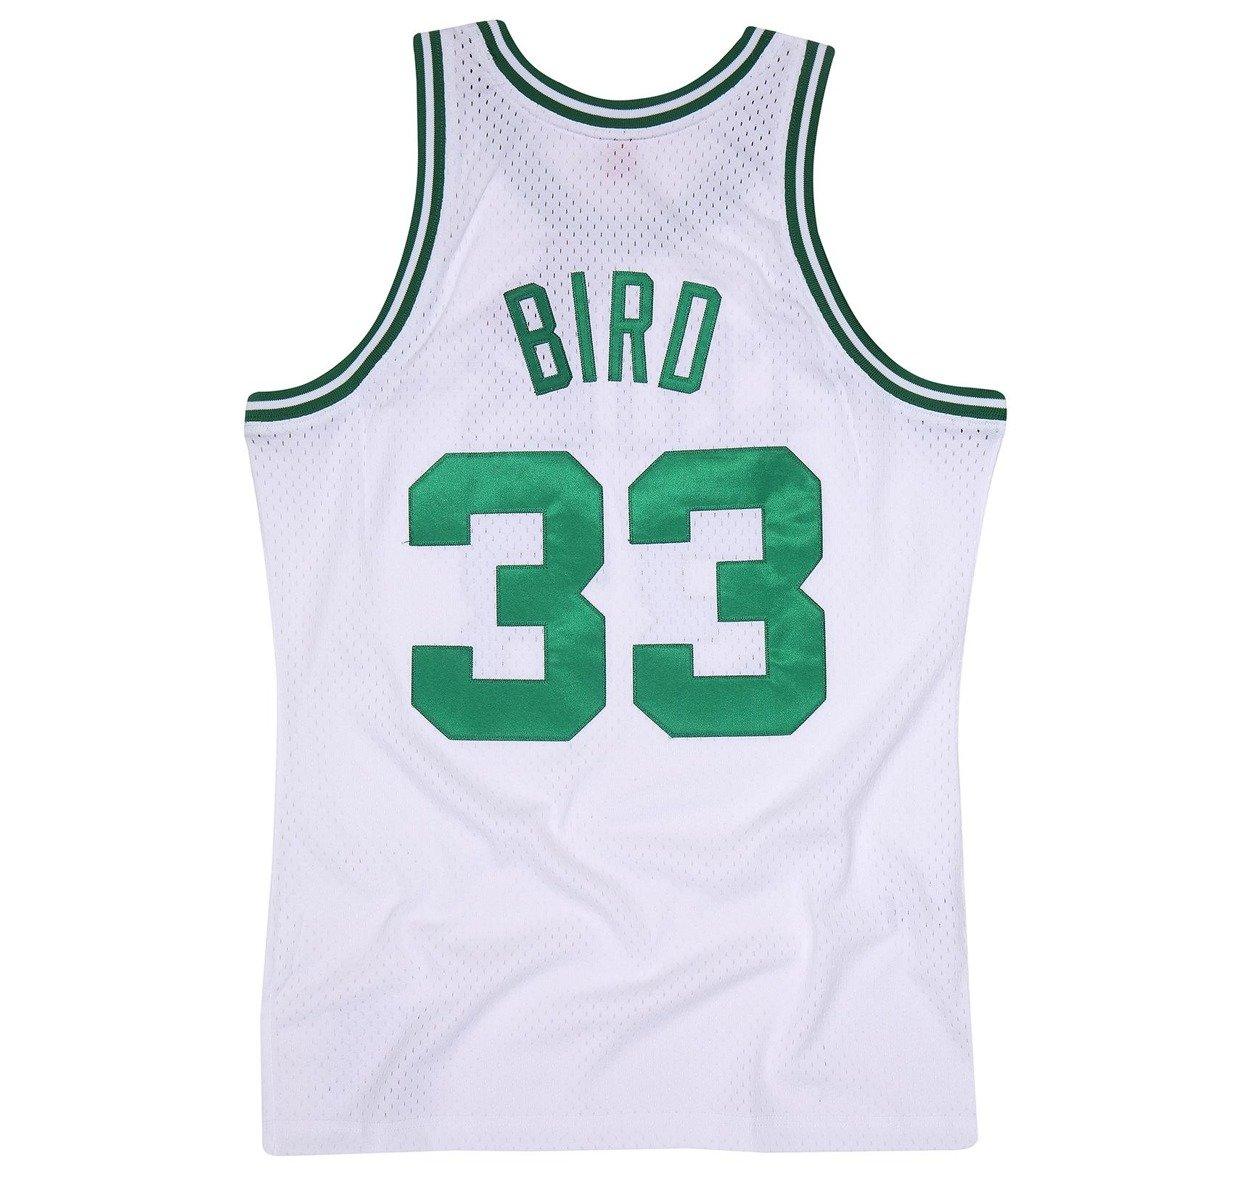 newest d464b 3e5e3 Mitchell & Ness NBA Boston Celtics Larry Bird Swingman Jersey